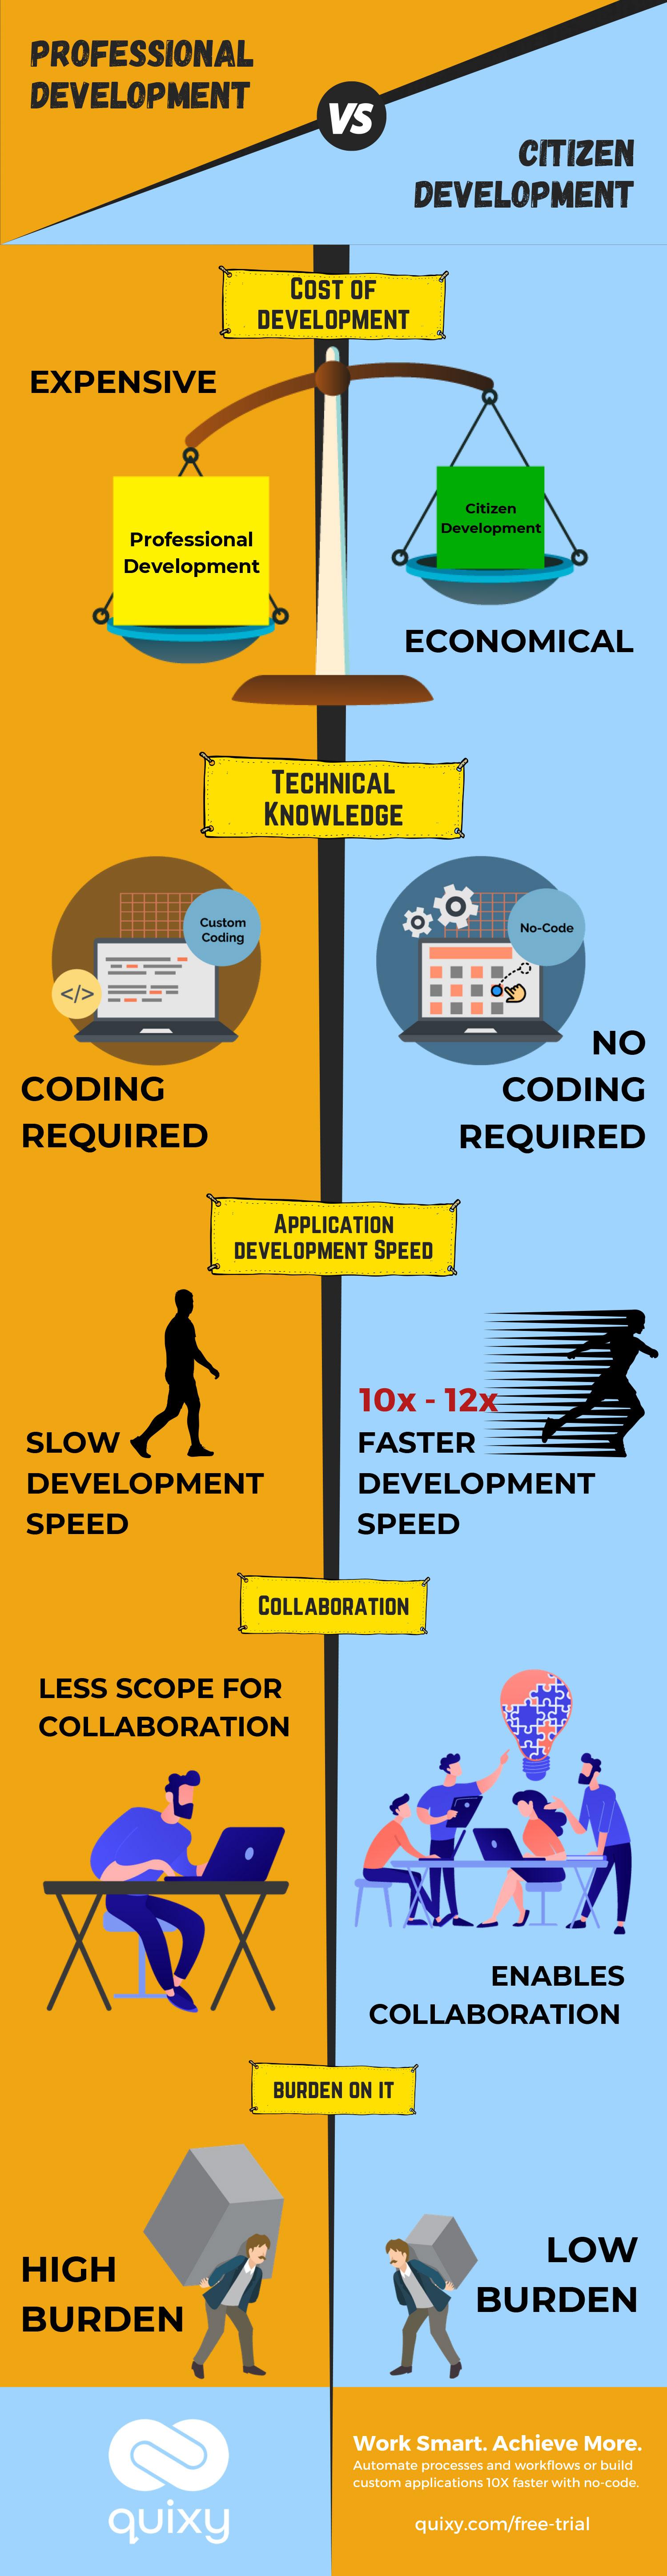 Professional development vs citizen development Infographic